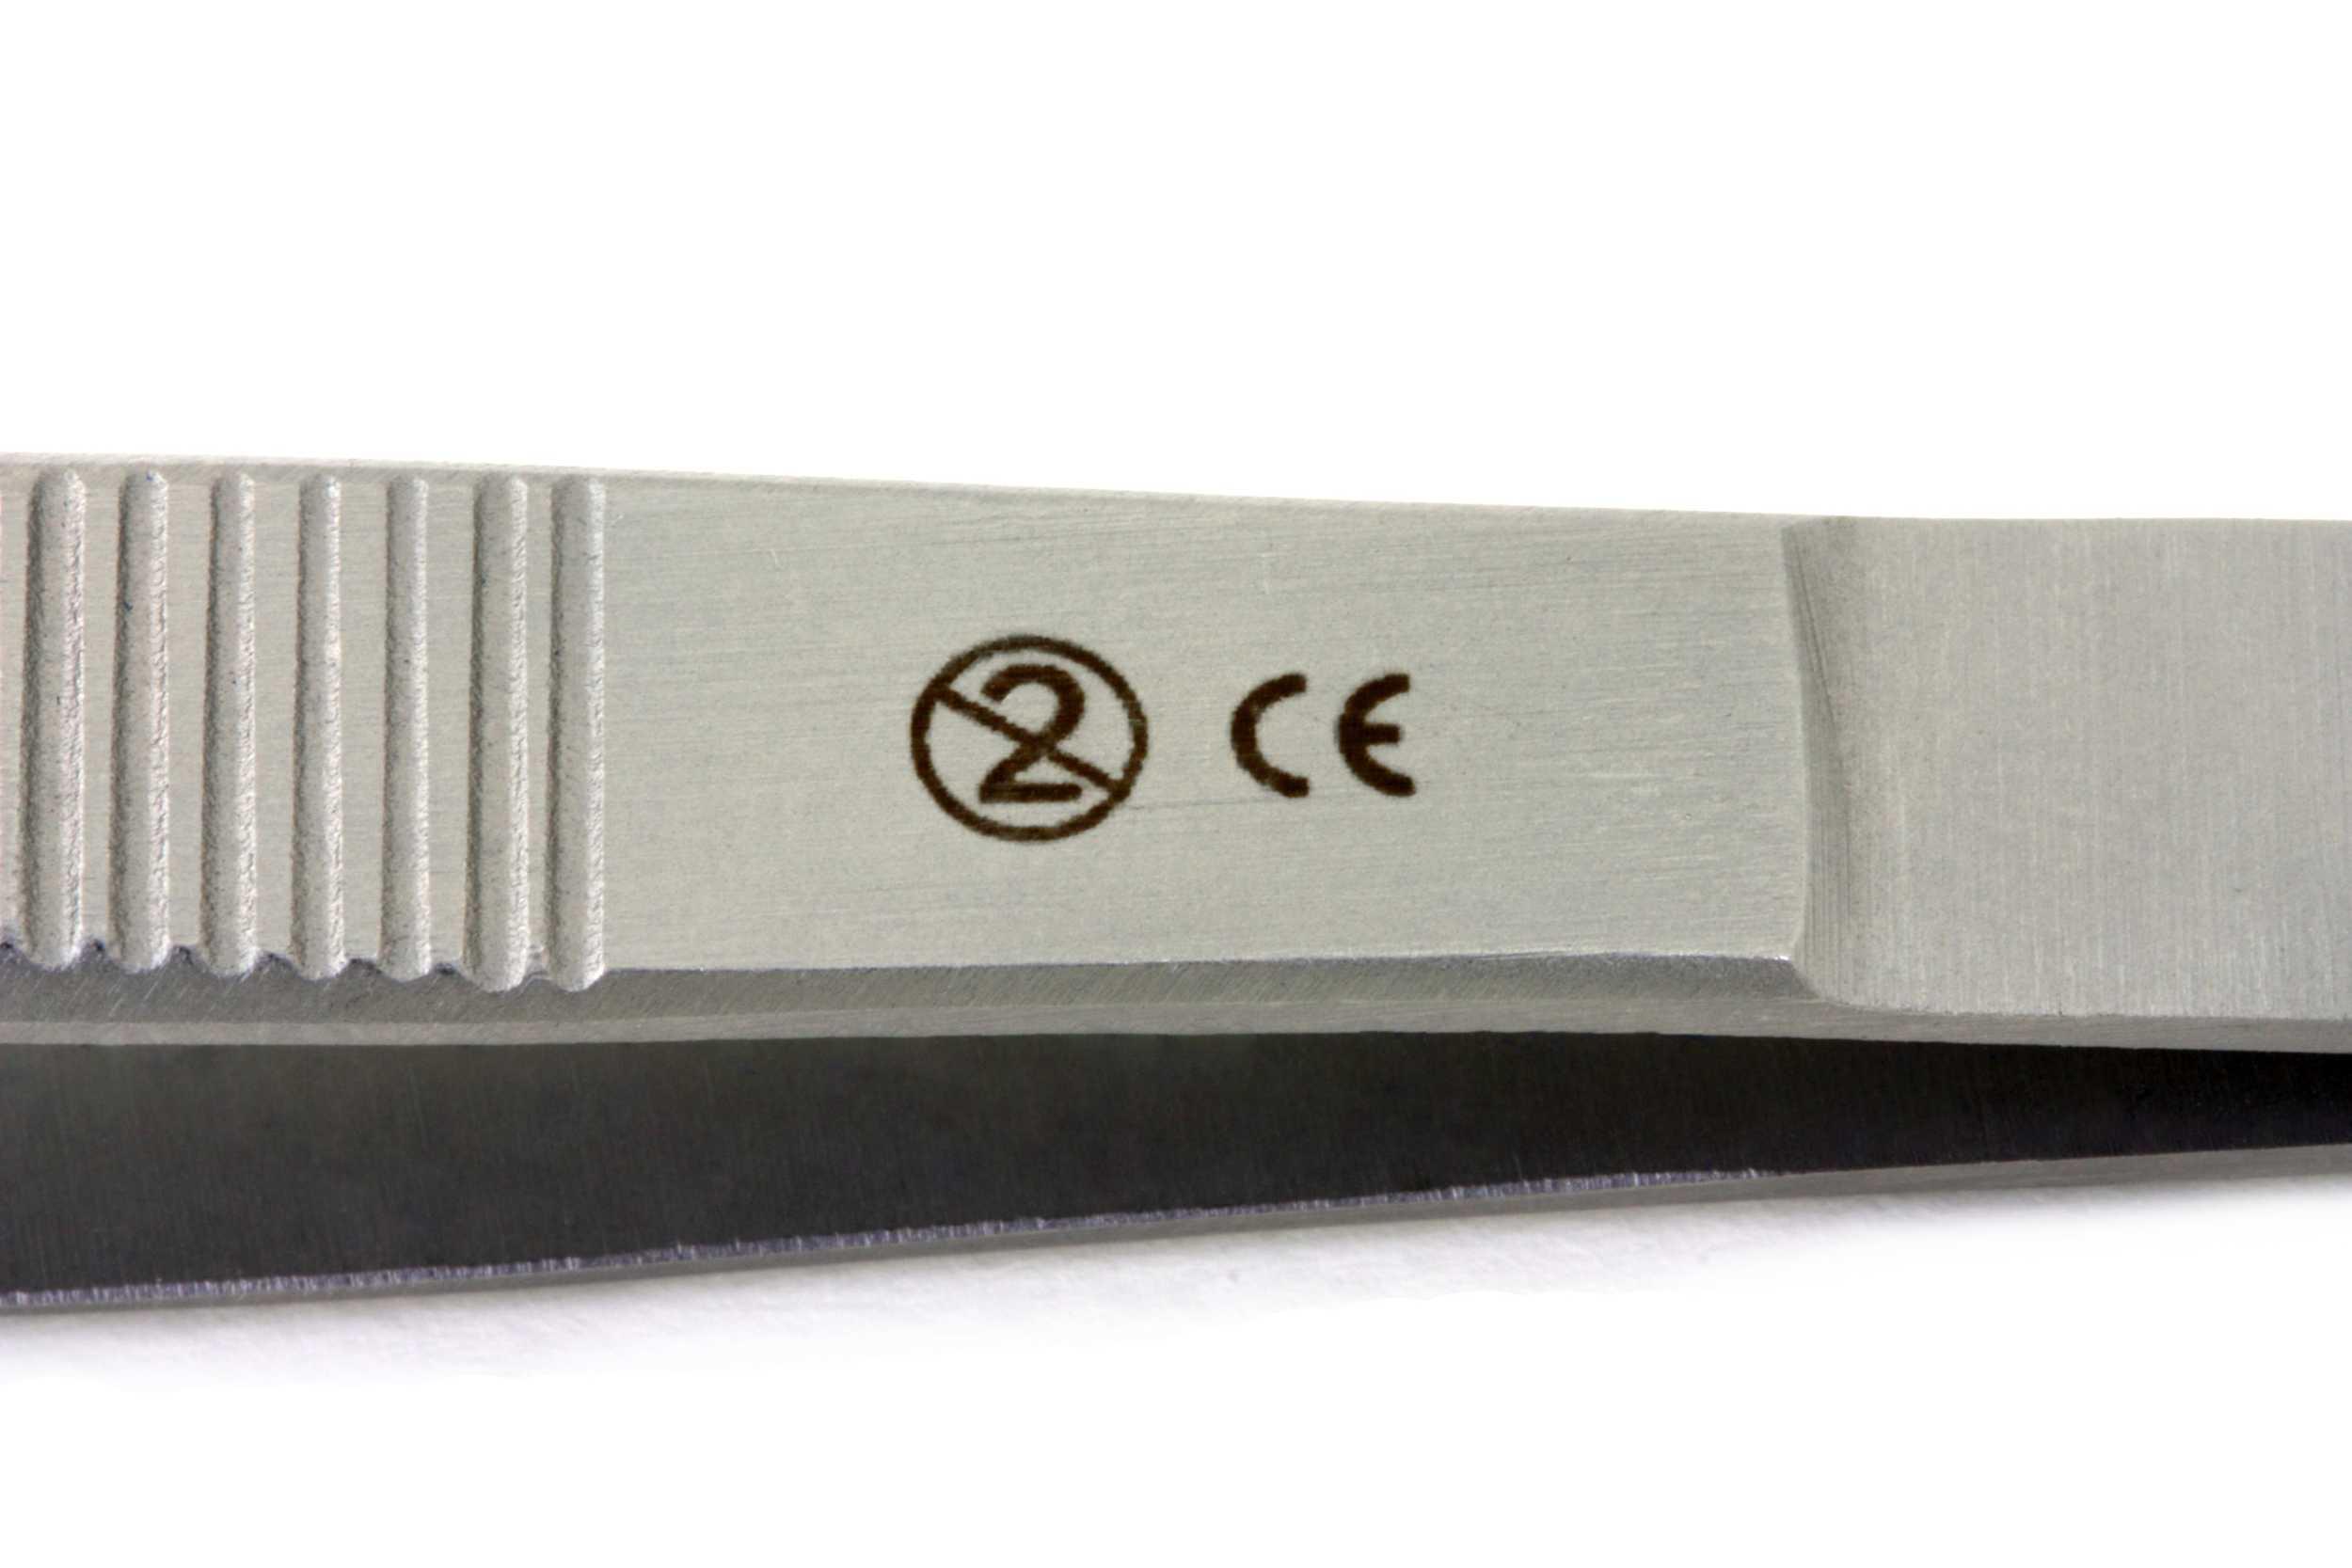 Liber Medical disposable instrumentarium met CE en single use sign